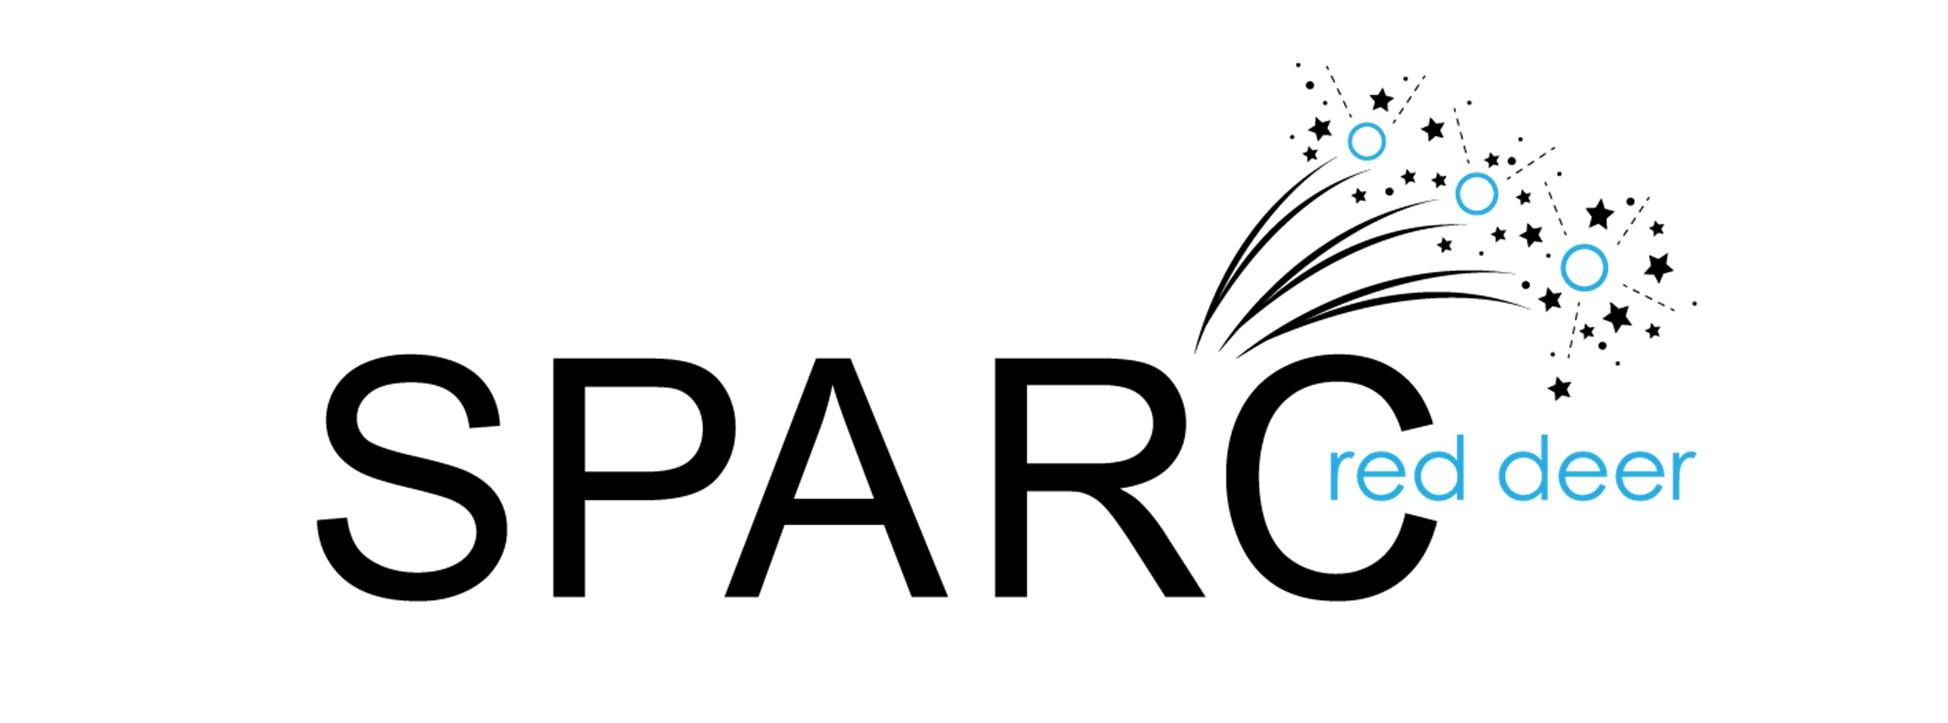 SS-SPARC